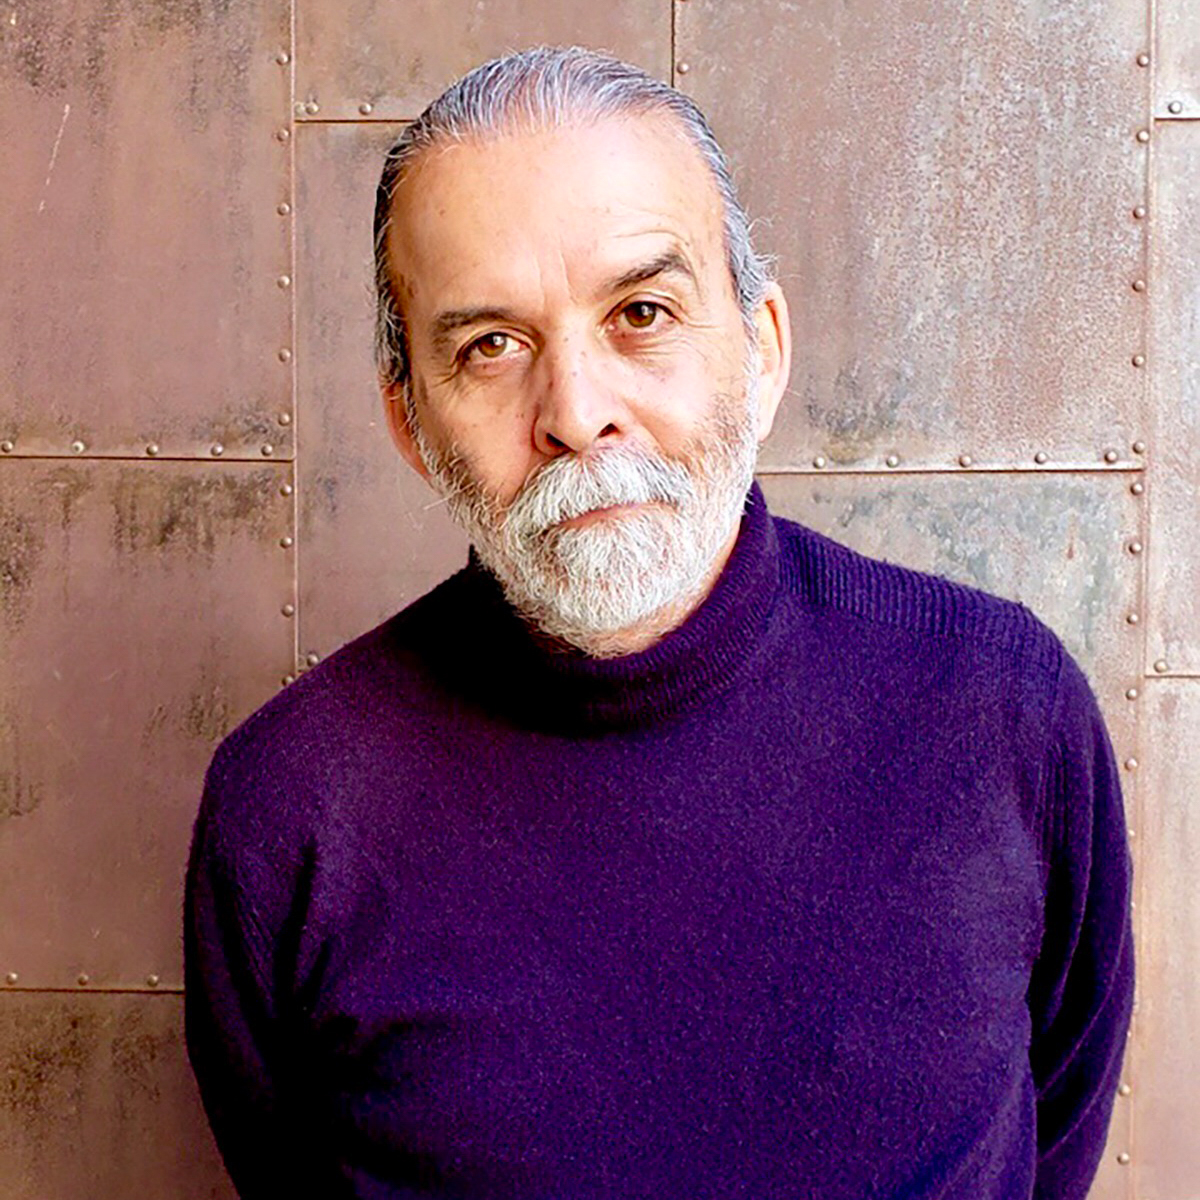 Artist, writer, and educator Harry Gamboa Jr, 2019. Photo by Barbara Carrasco.